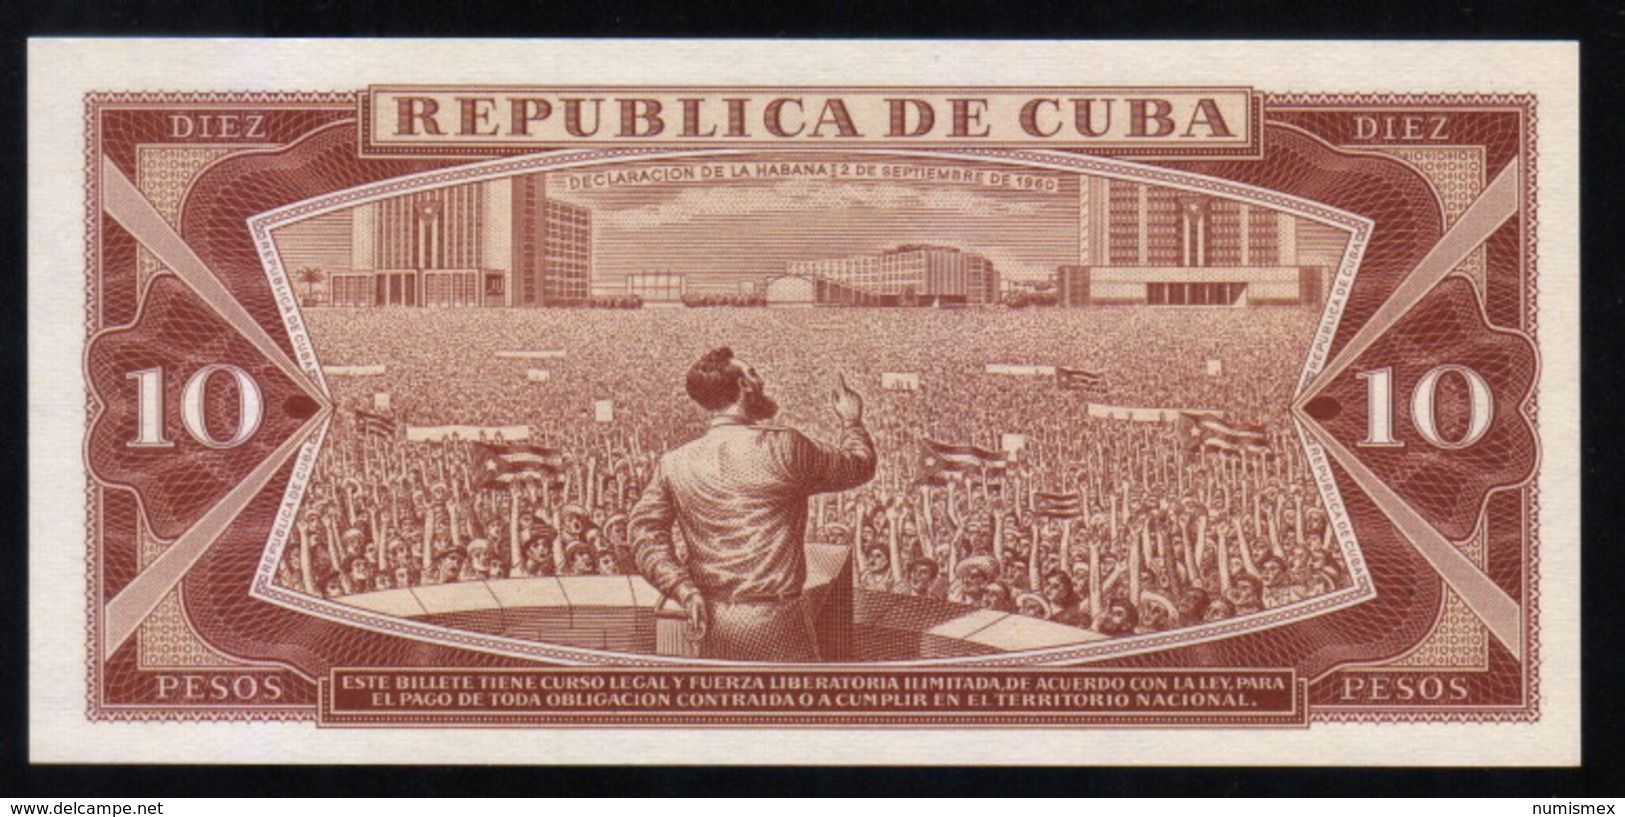 Caribe  / 10 PESOS 1986 Serie FC-01 000601 FIRST SERIE LOW NUMBER Pick 104c UNC - Cuba